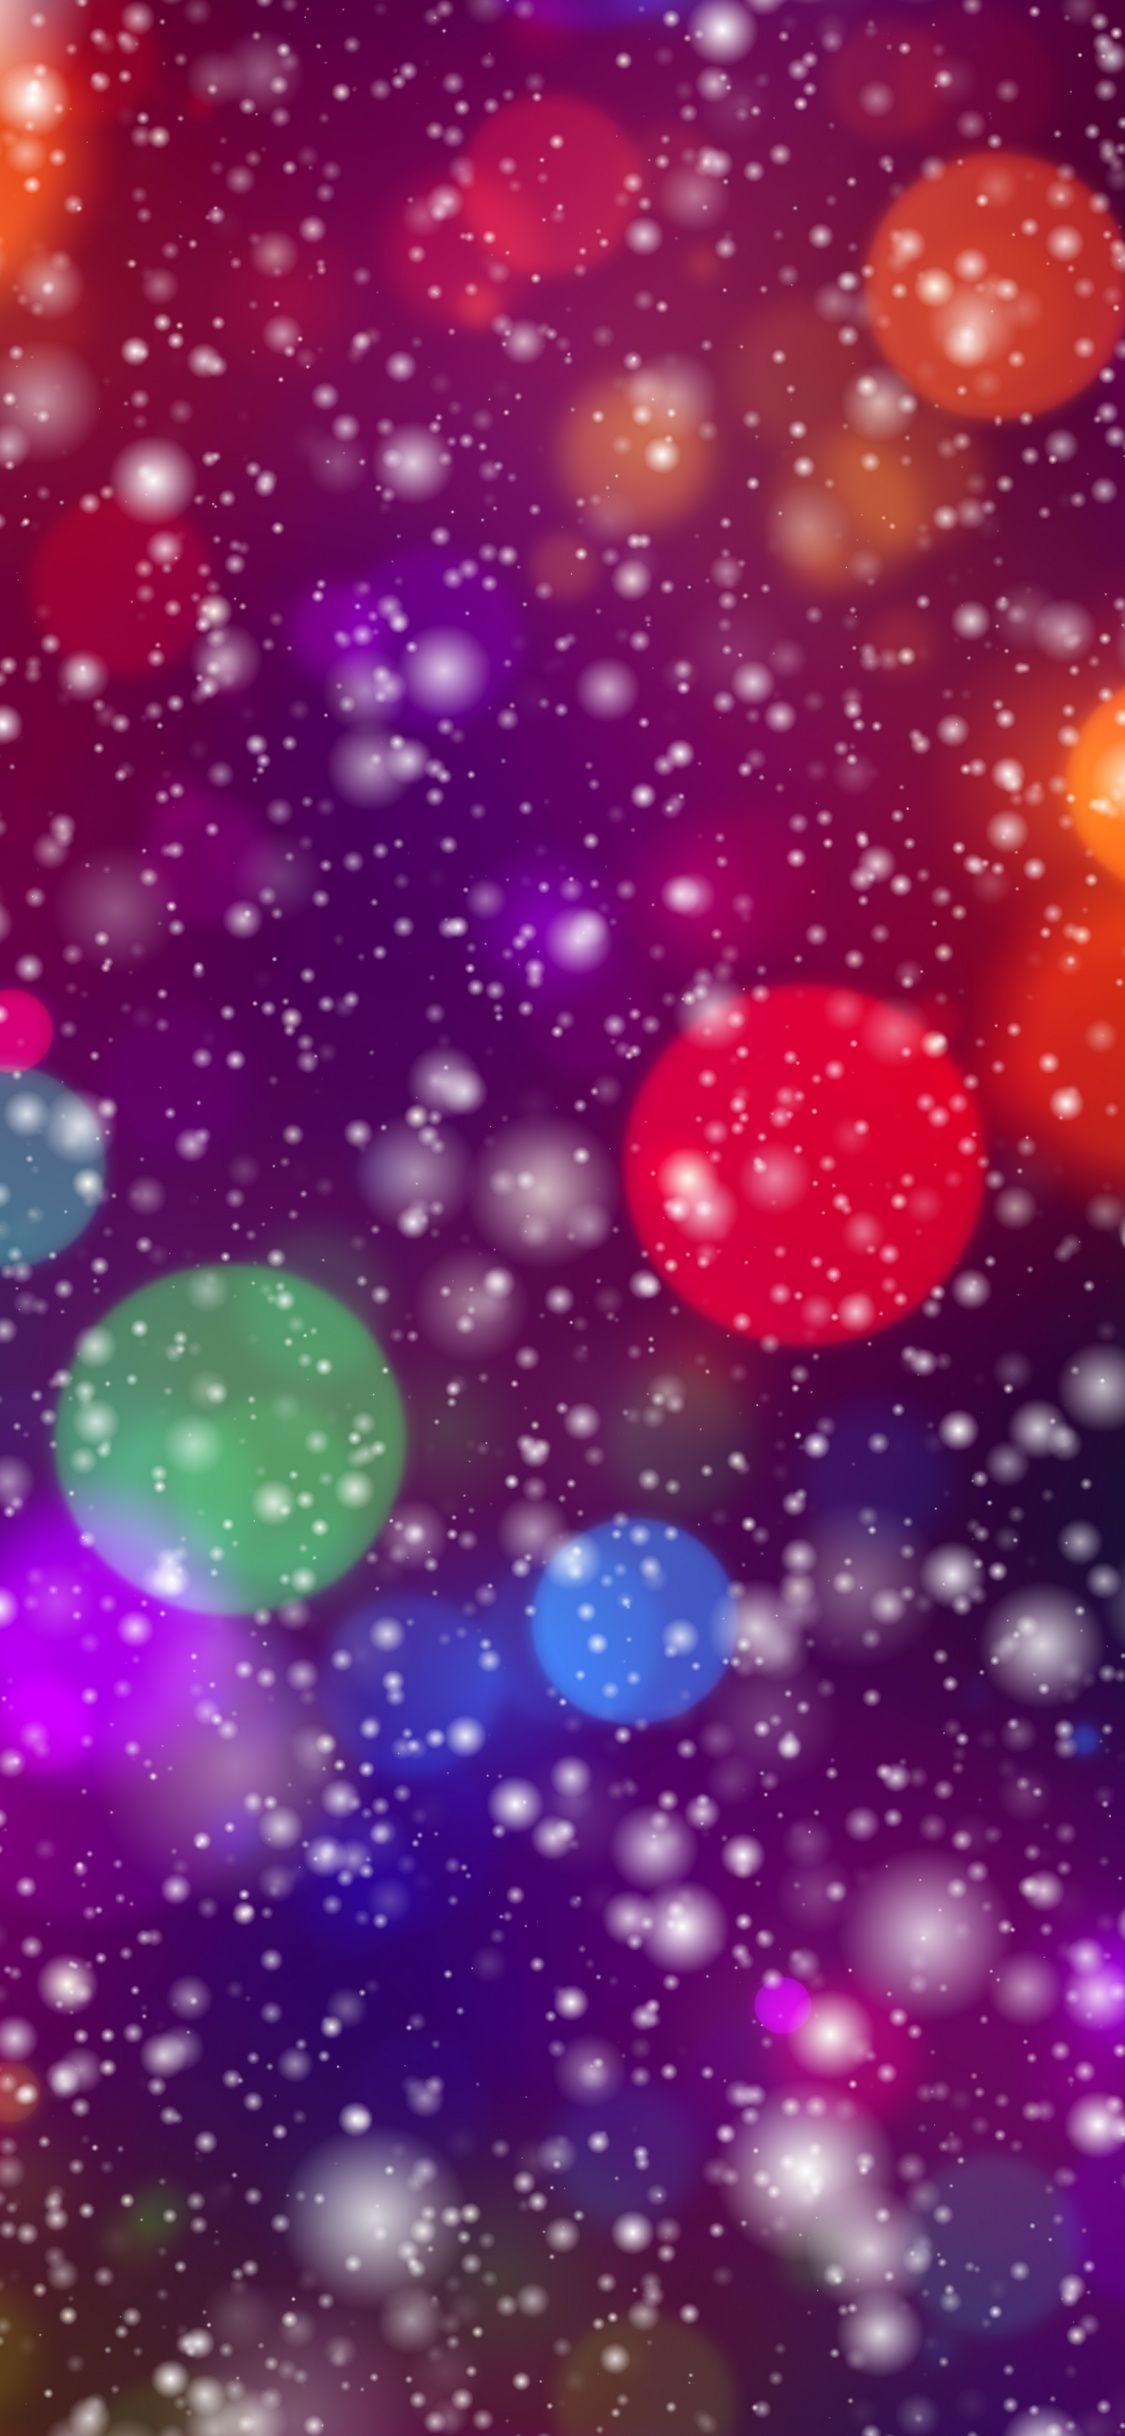 Bokeh Glare Glitter Colorful Digital Art 1125x2436 Wallpaper Winter Wallpaper Wallpaper Art Wallpaper